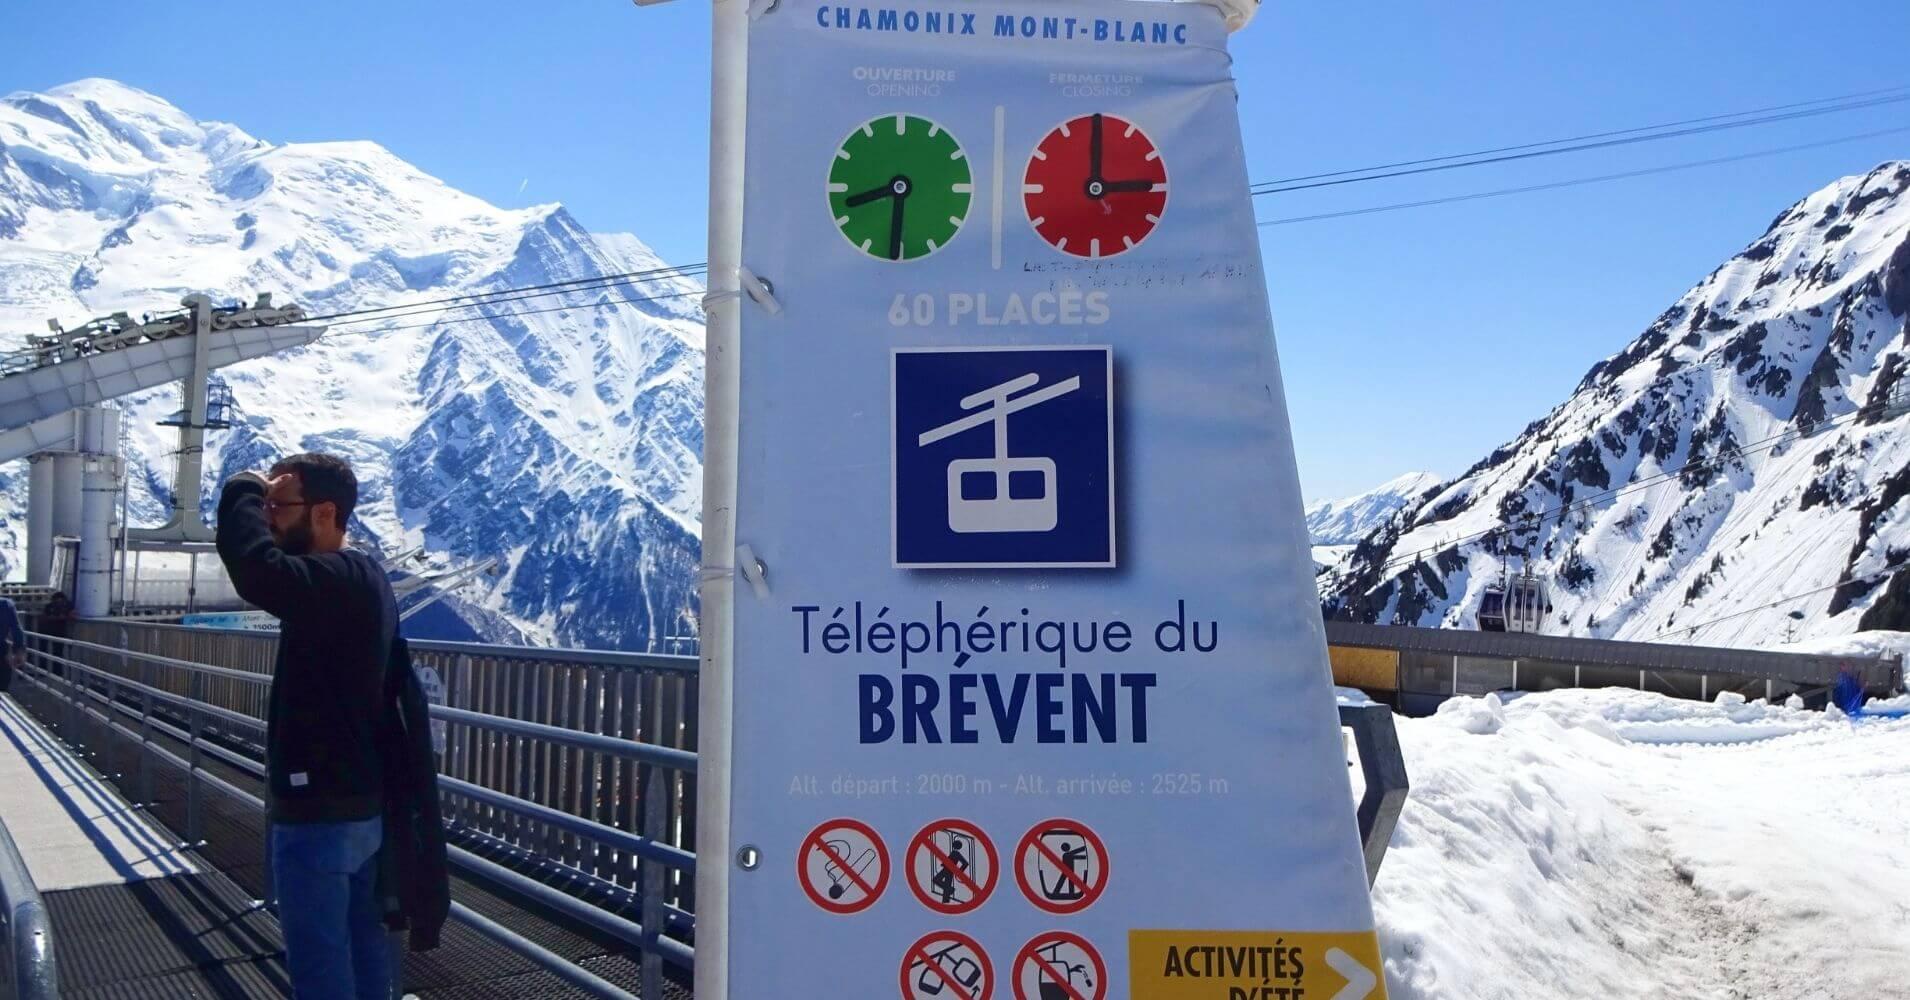 Teleférico de Brevent. Chamonix. Alta Saboya, Auvernia-Ródano-Alpes. Francia.